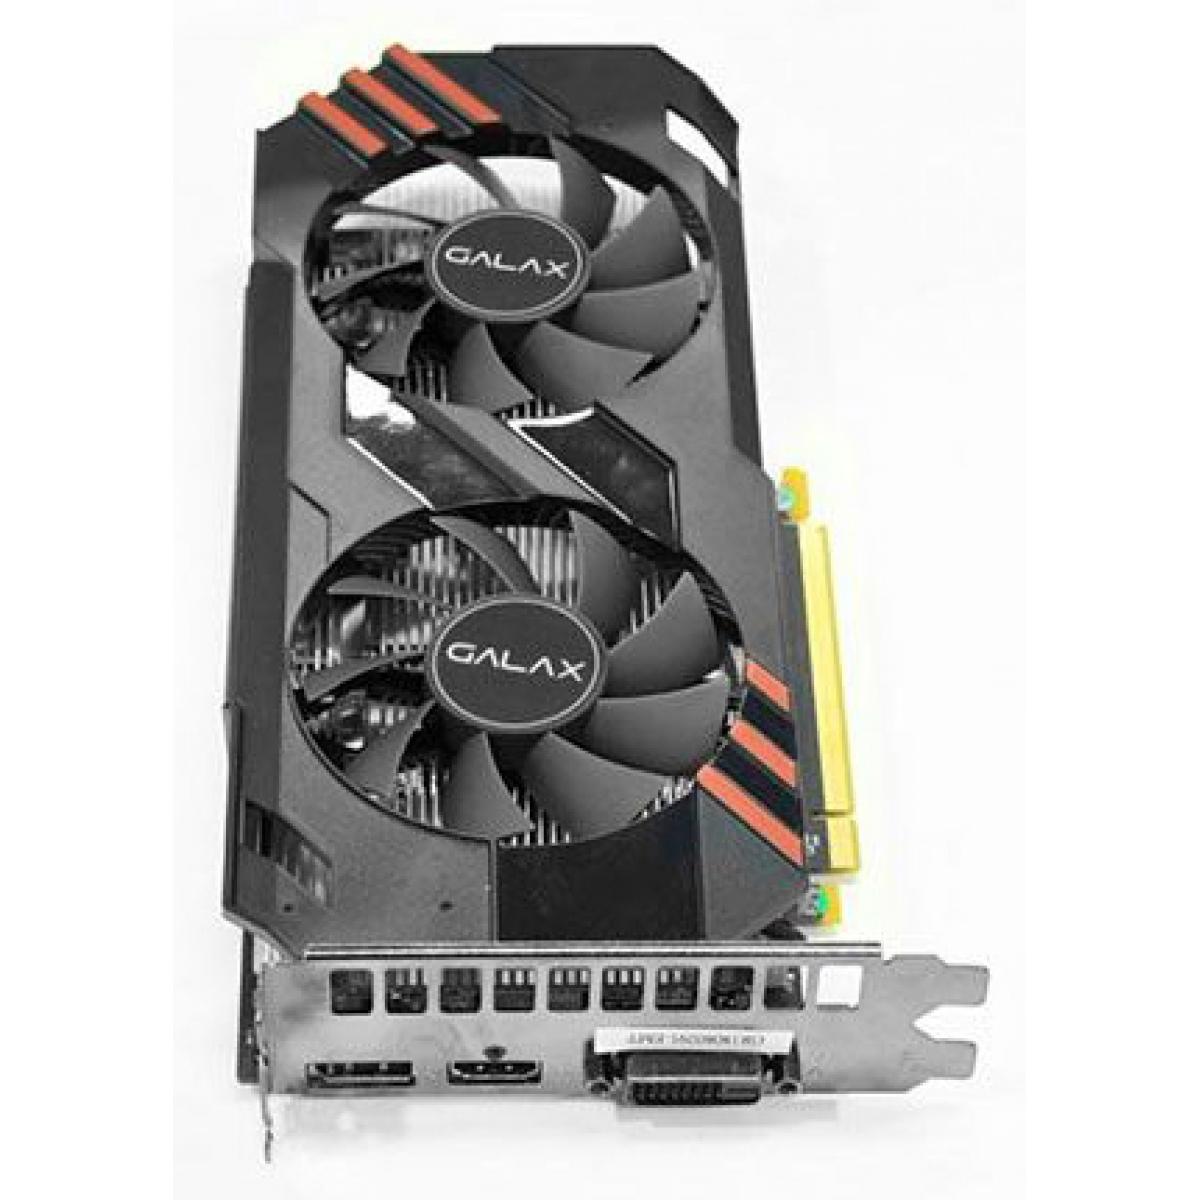 Placa de Vídeo Galax GeForce GTX 1060 OC Dual, 6GB GDDR5, 192Bit, 60NRH7DSR4BY